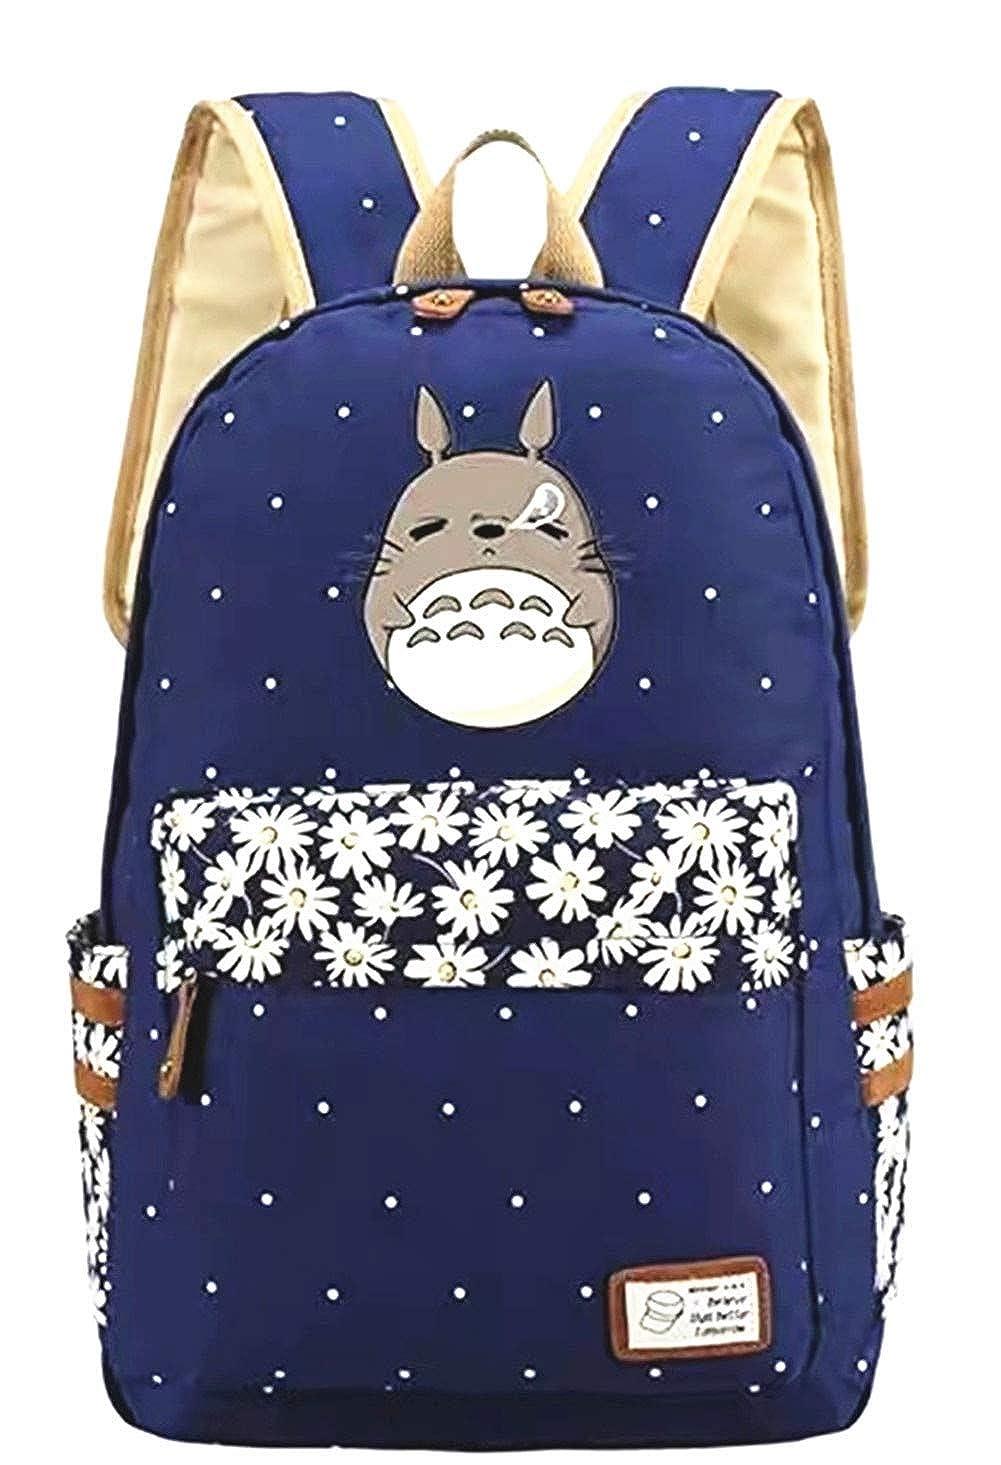 Anime My Neighbor Totoro Backpack Cosplay Canvas Bookbag Rucksack School  Shoulder Bag (Blue 1)  Amazon.co.uk  Clothing aa44254894